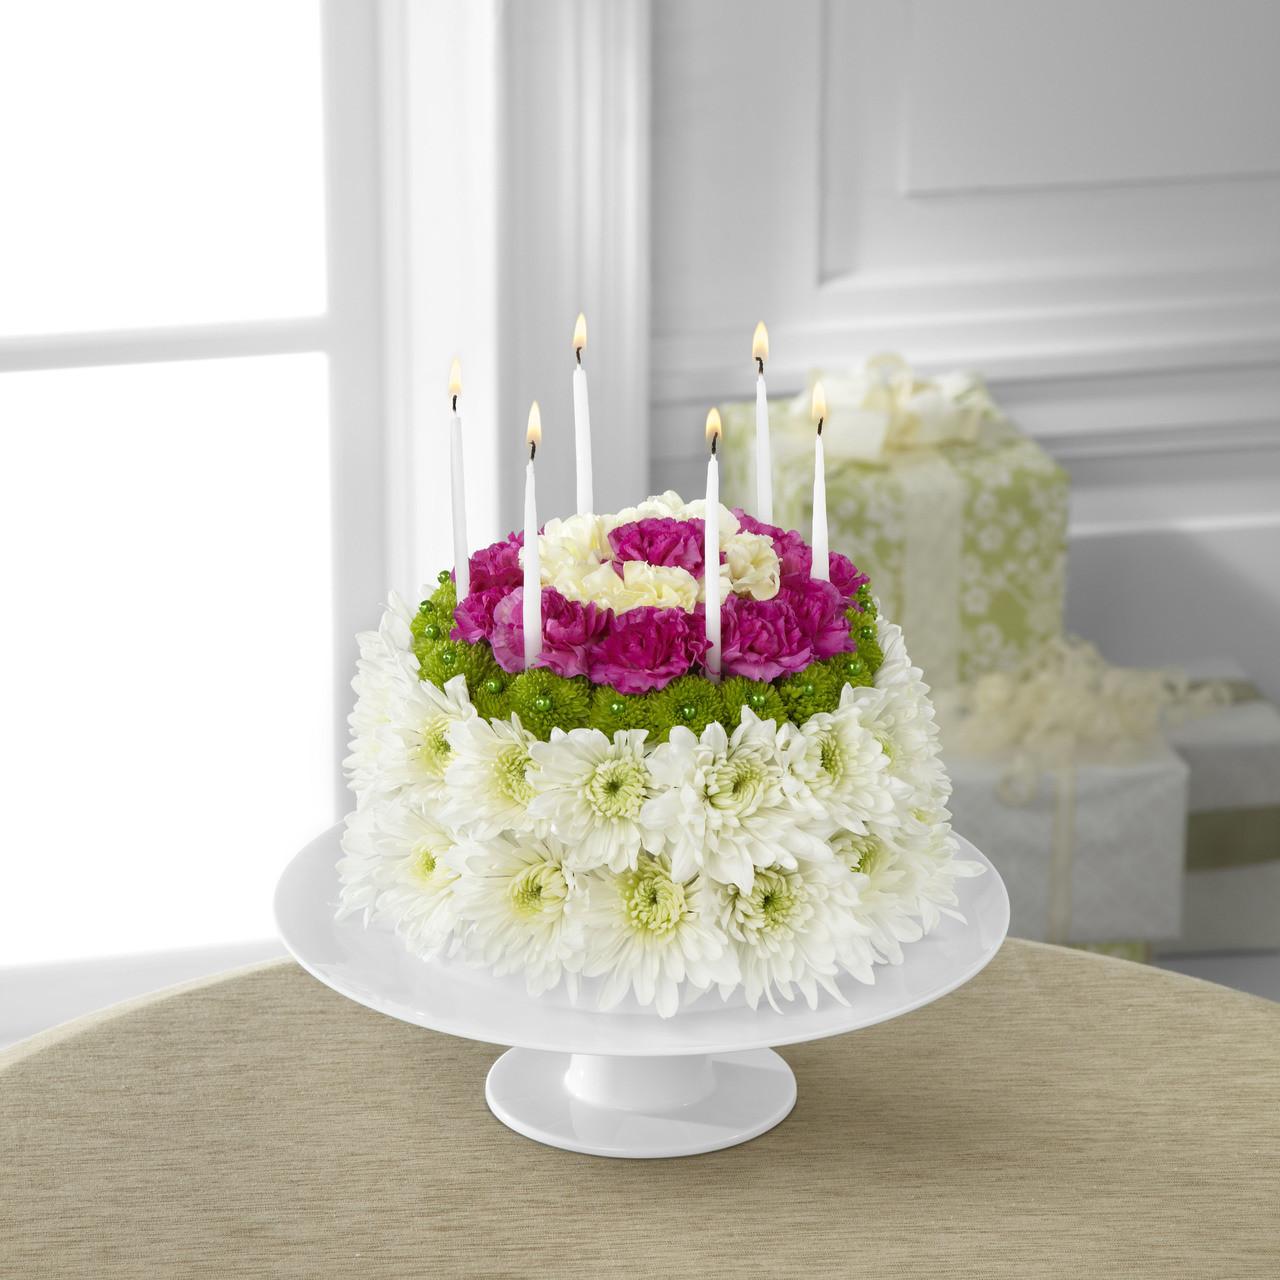 Wonderful Wishes Floral Cake Flowers Long Island